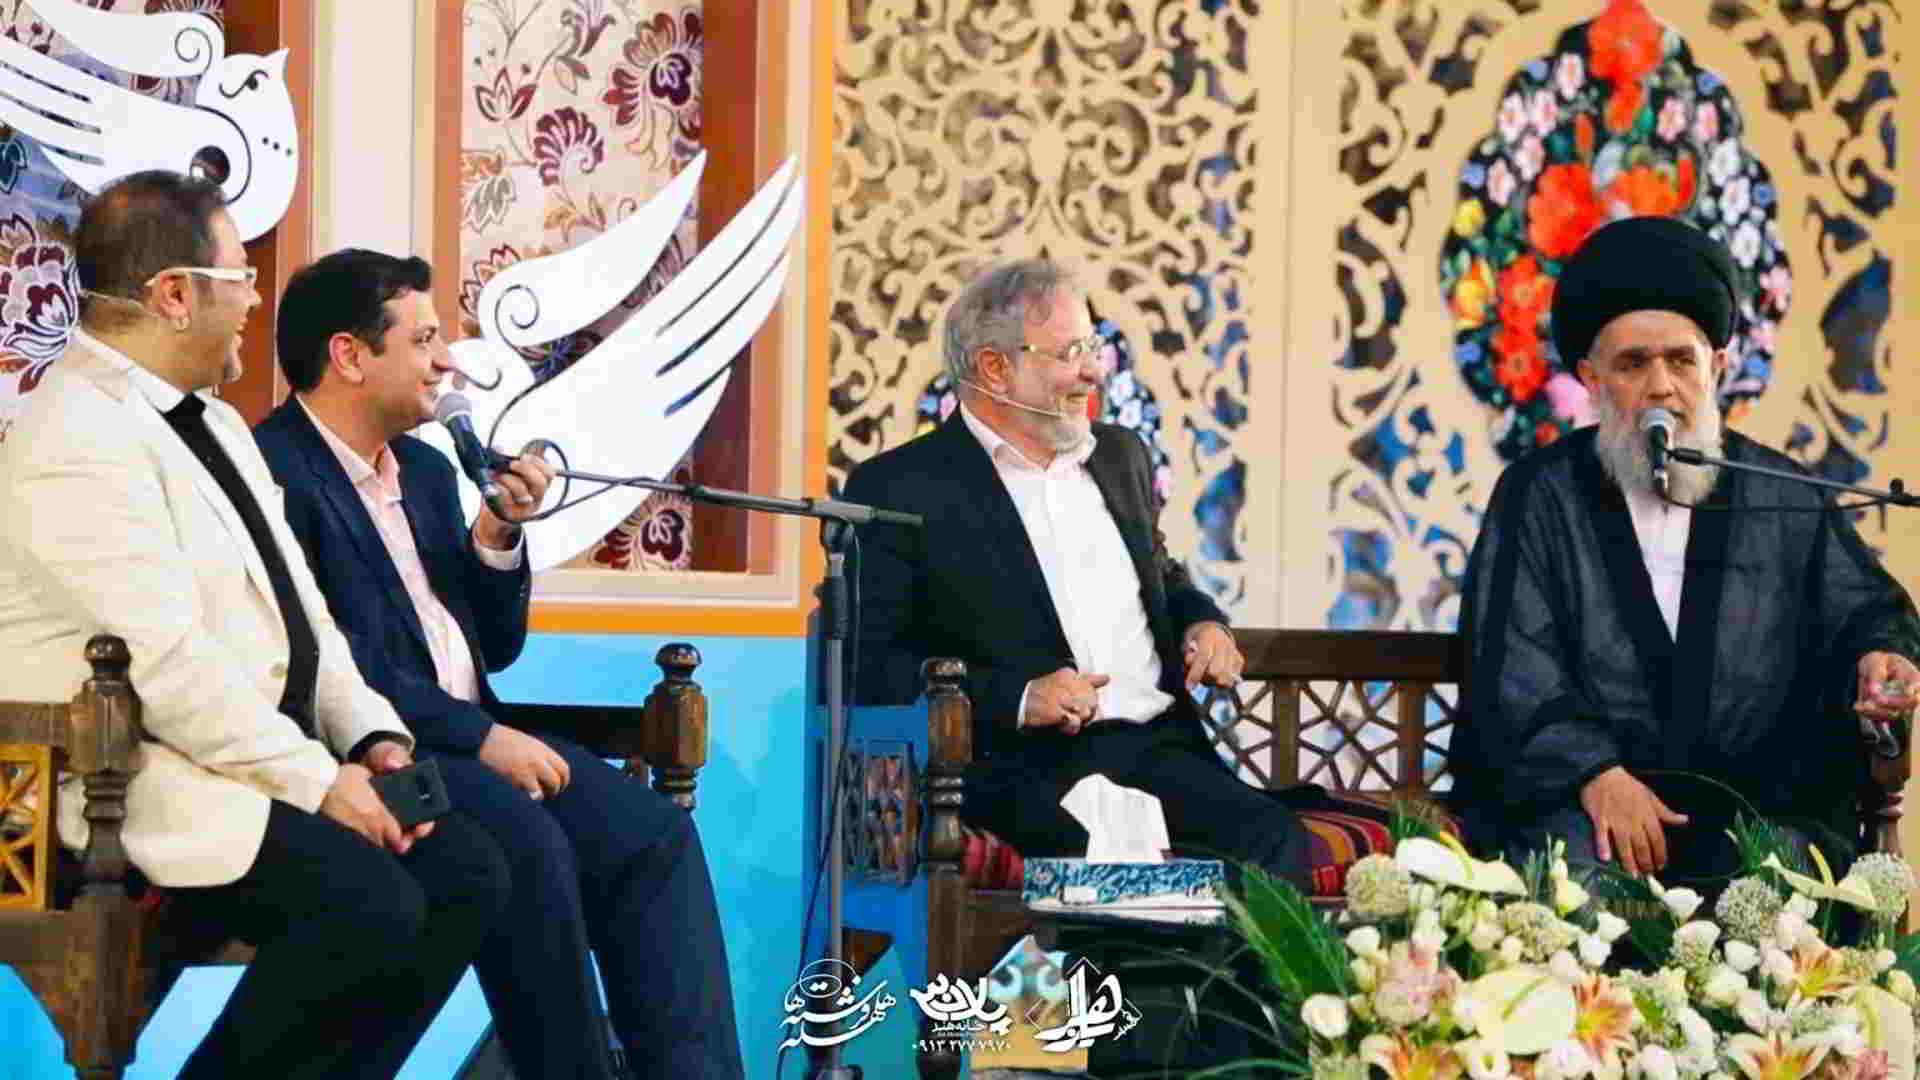 ماشین علی اکبر رائفی پور